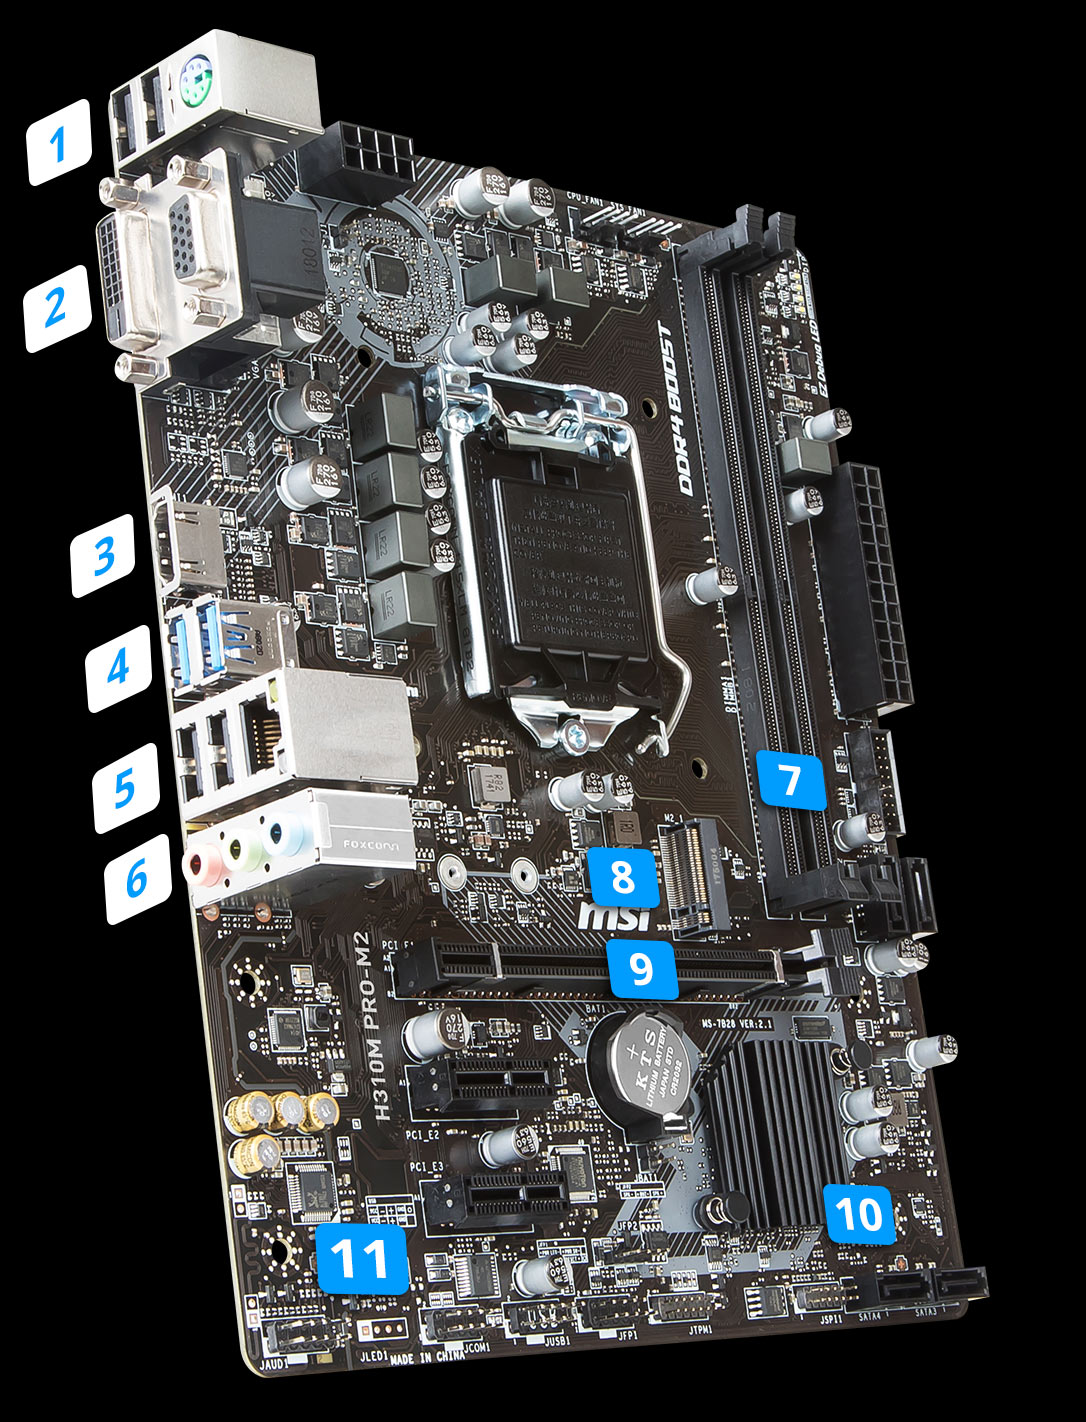 H310M PRO-M2 | Motherboard - The world leader in motherboard design